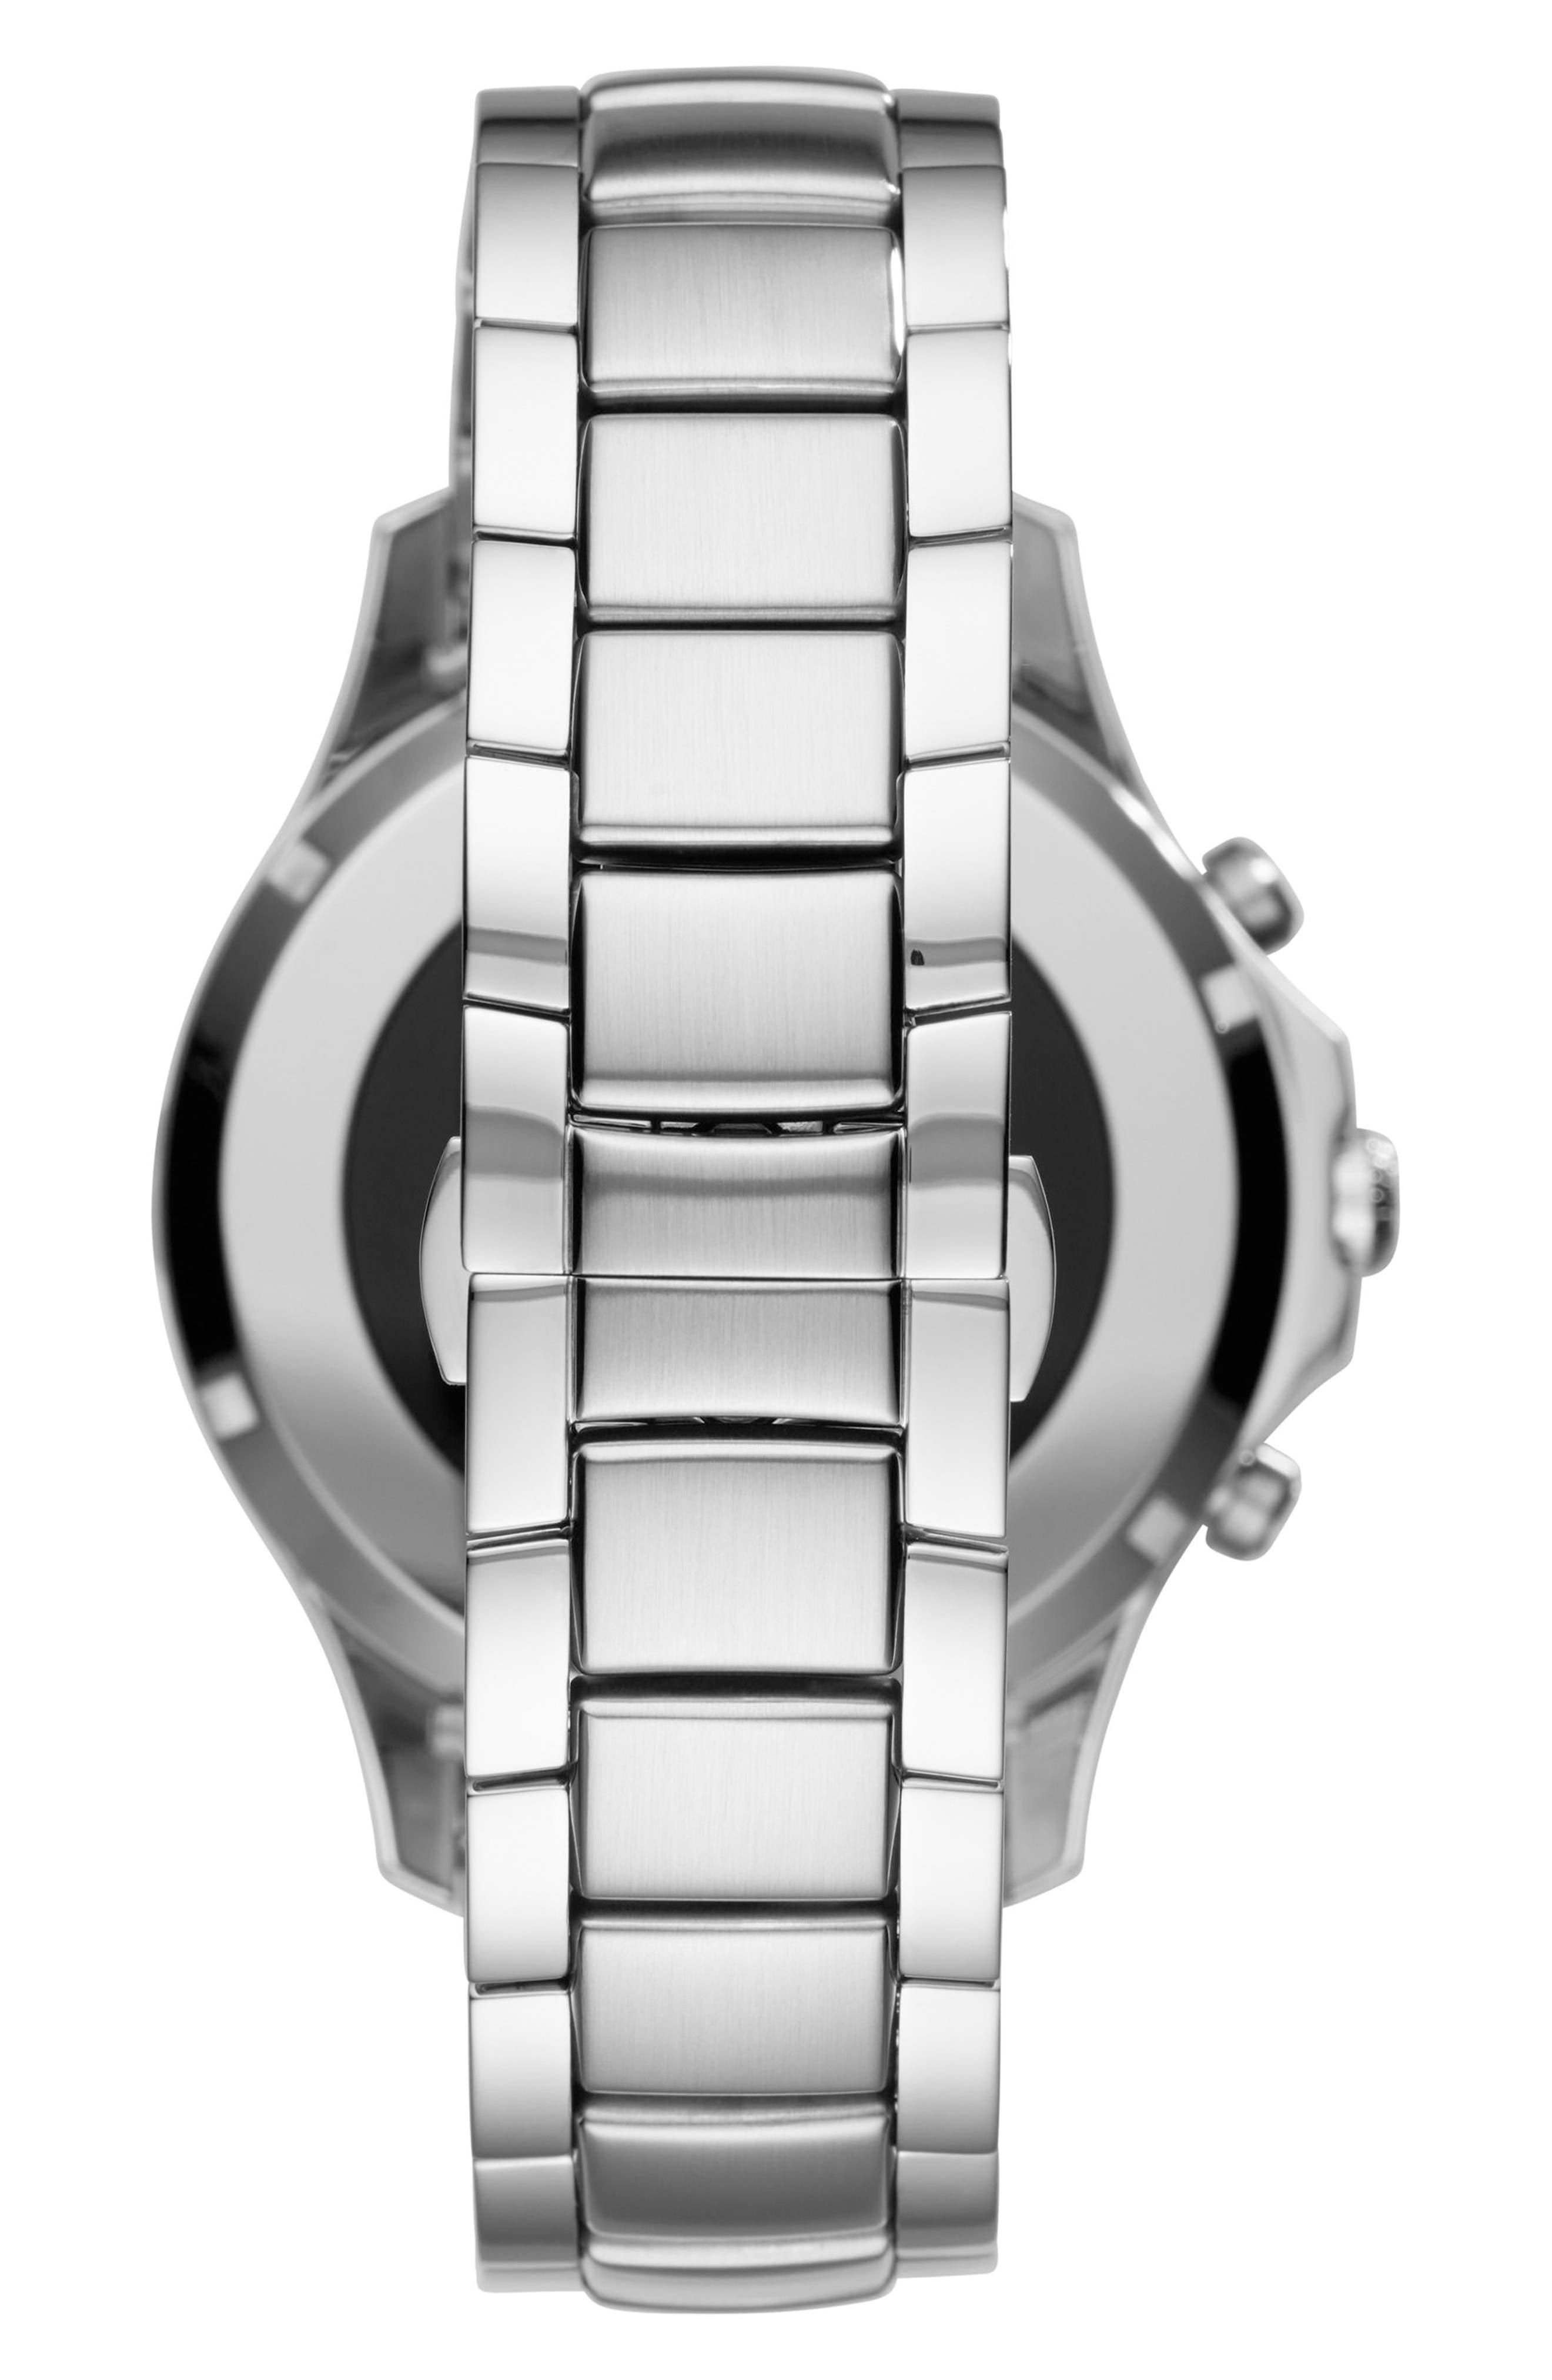 Touchscreen Bracelet Smartwatch, 46mm,                             Alternate thumbnail 2, color,                             BLACK/ SILVER